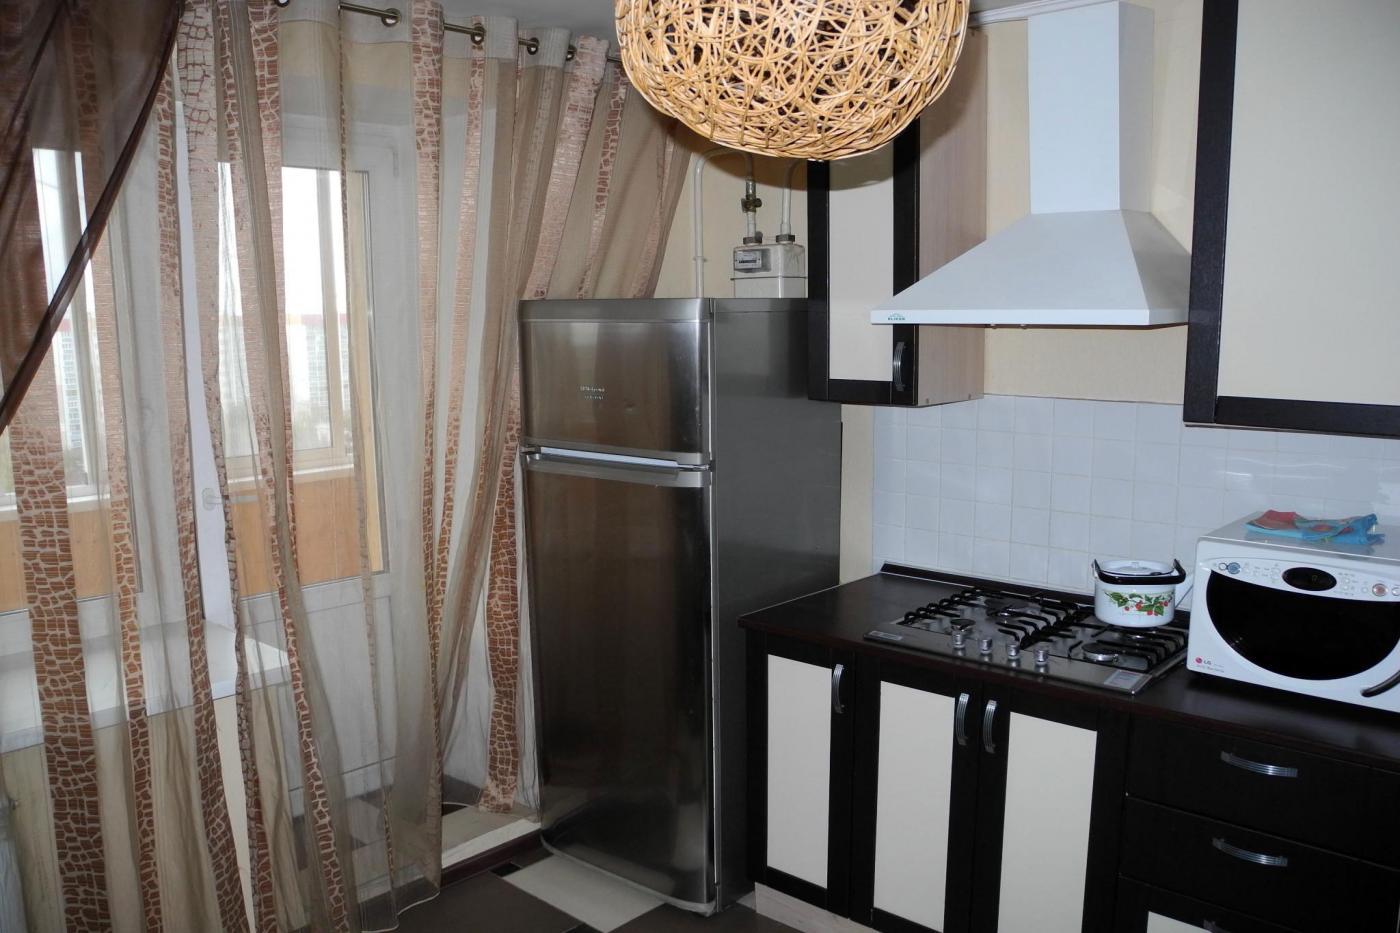 2-комнатная квартира посуточно (вариант № 3876), ул. Войкова улица, фото № 11